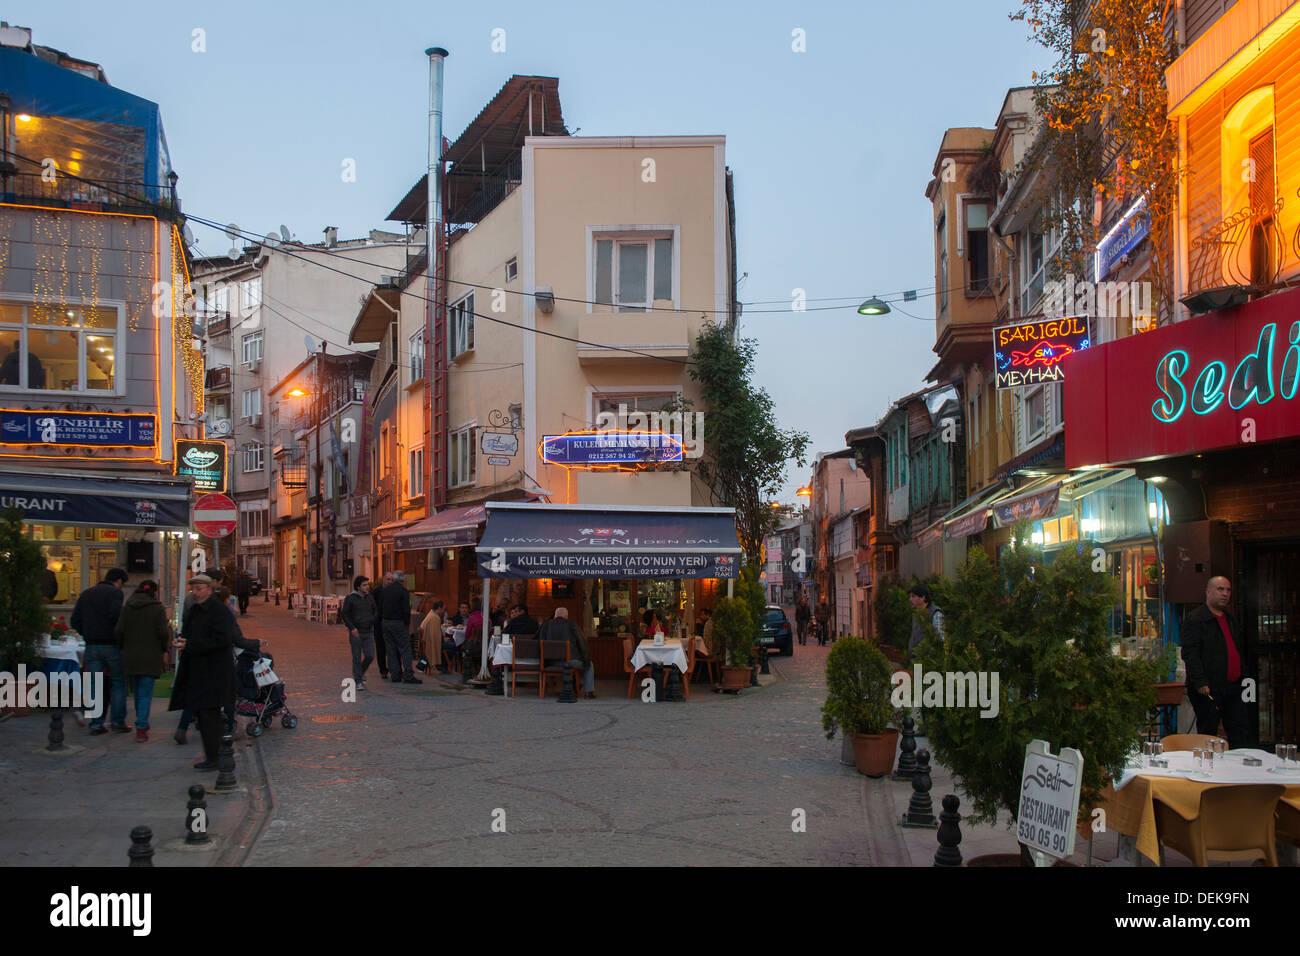 Istanbul, Samatya, Fischlokale am Abend - Stock Image